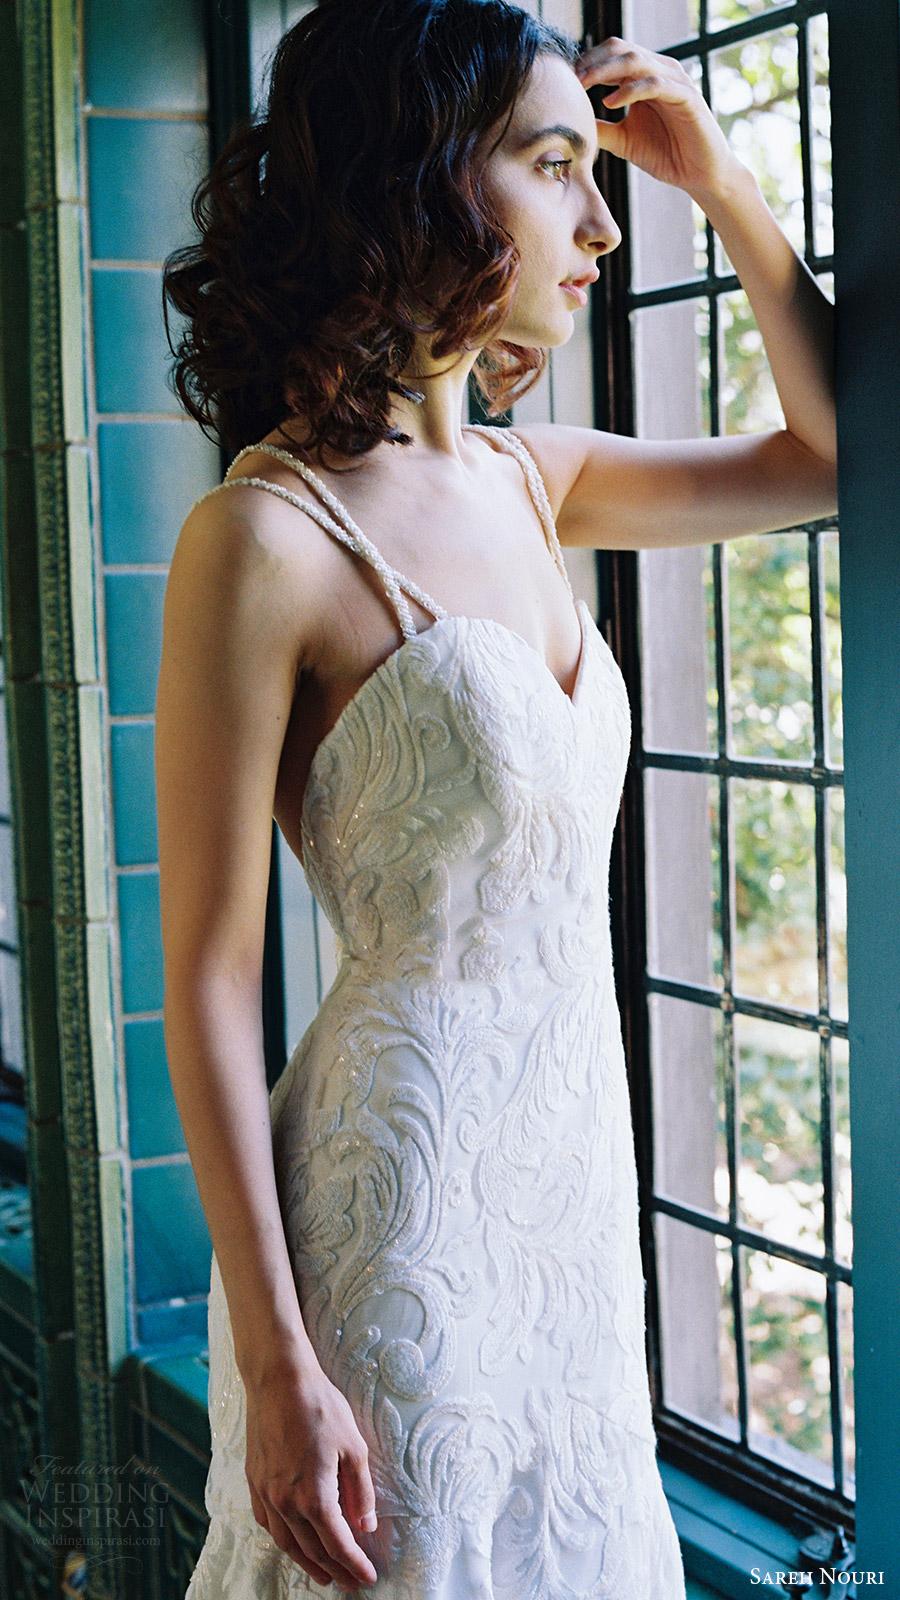 sareh nouri bridal spring 2017 sleeveless double straps sweetheart mermaid lace wedding dress (lotus) zfv bodice